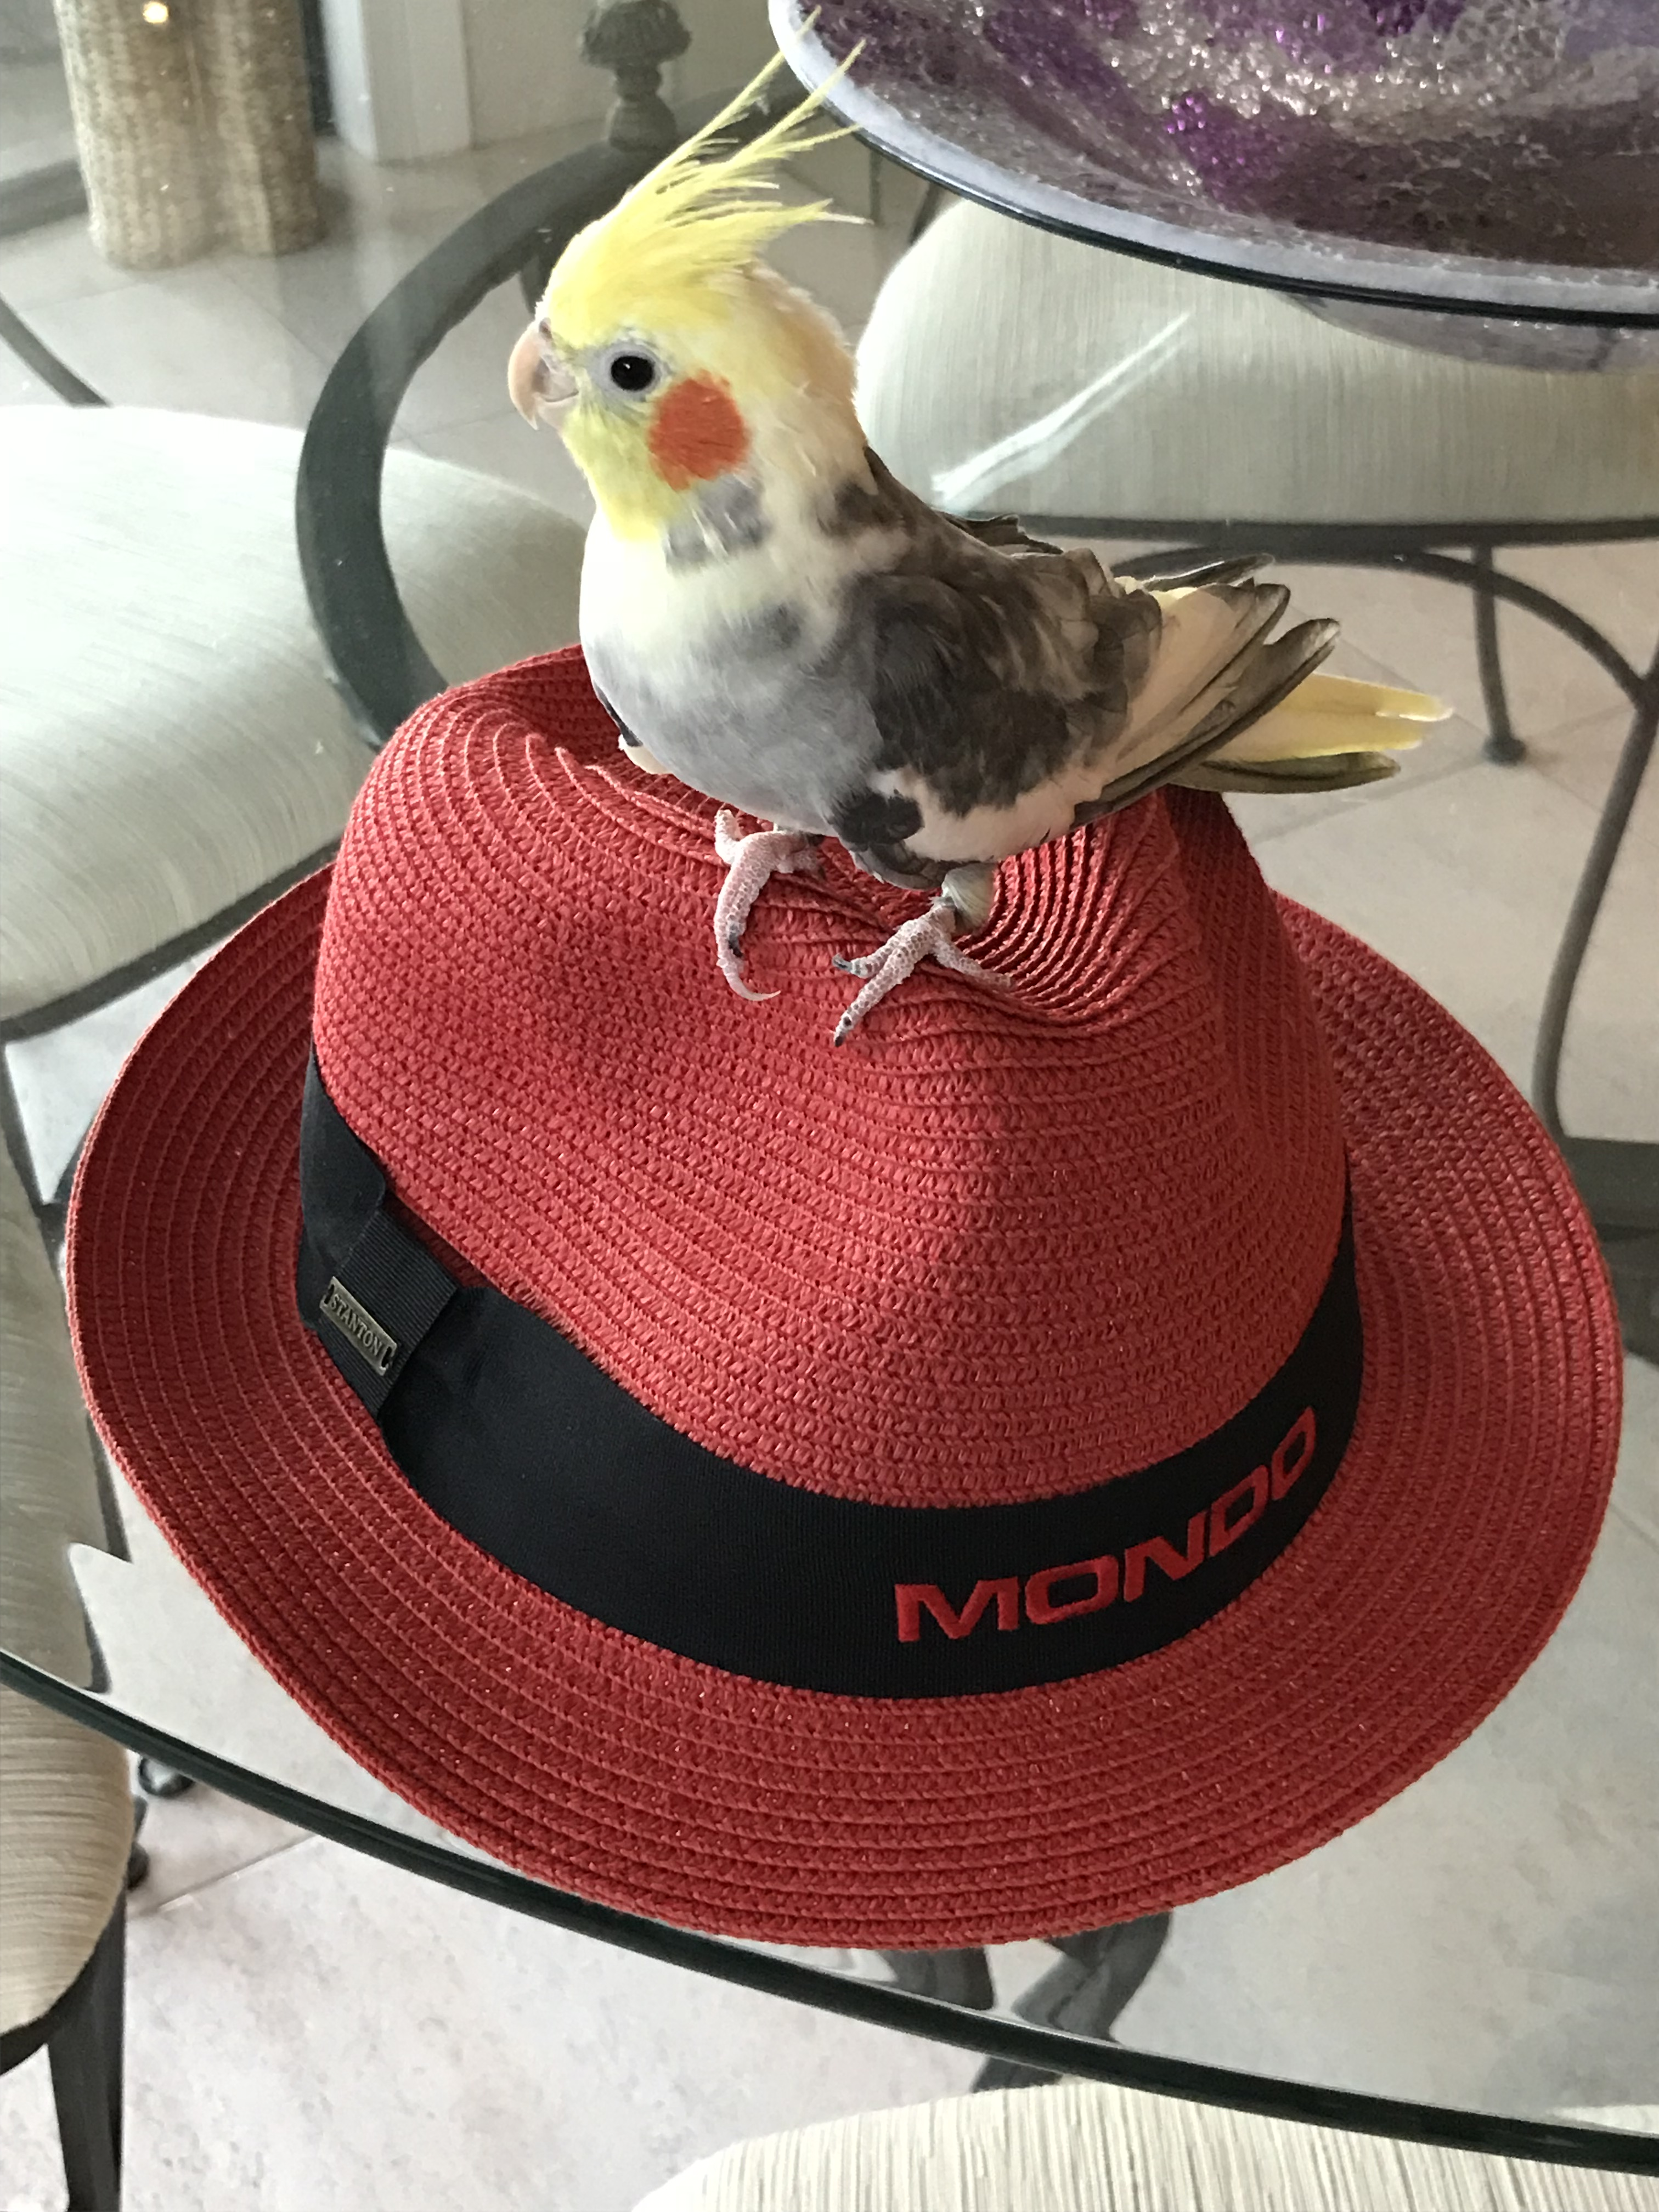 Sam chilling on the Mondo hat